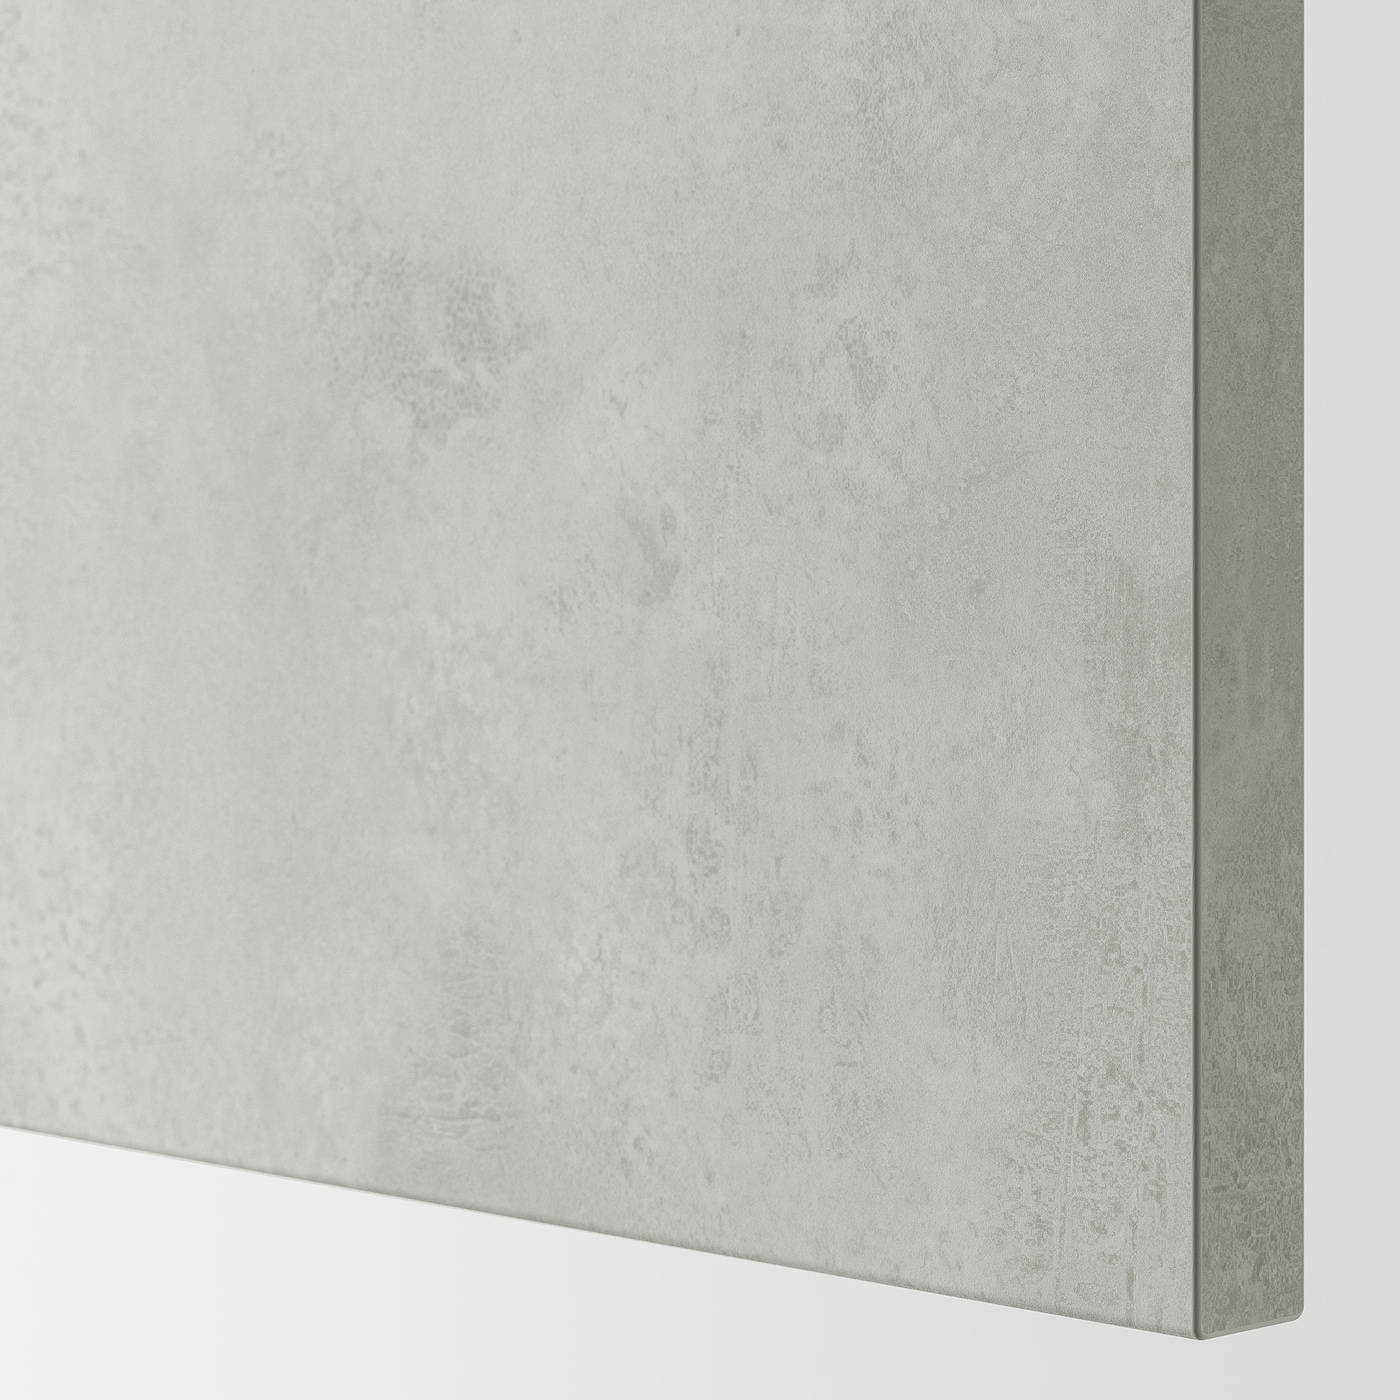 ENHET Wandschrank m 2 Böden/Türen, grau/Betonmuster, 60x17x75 cm